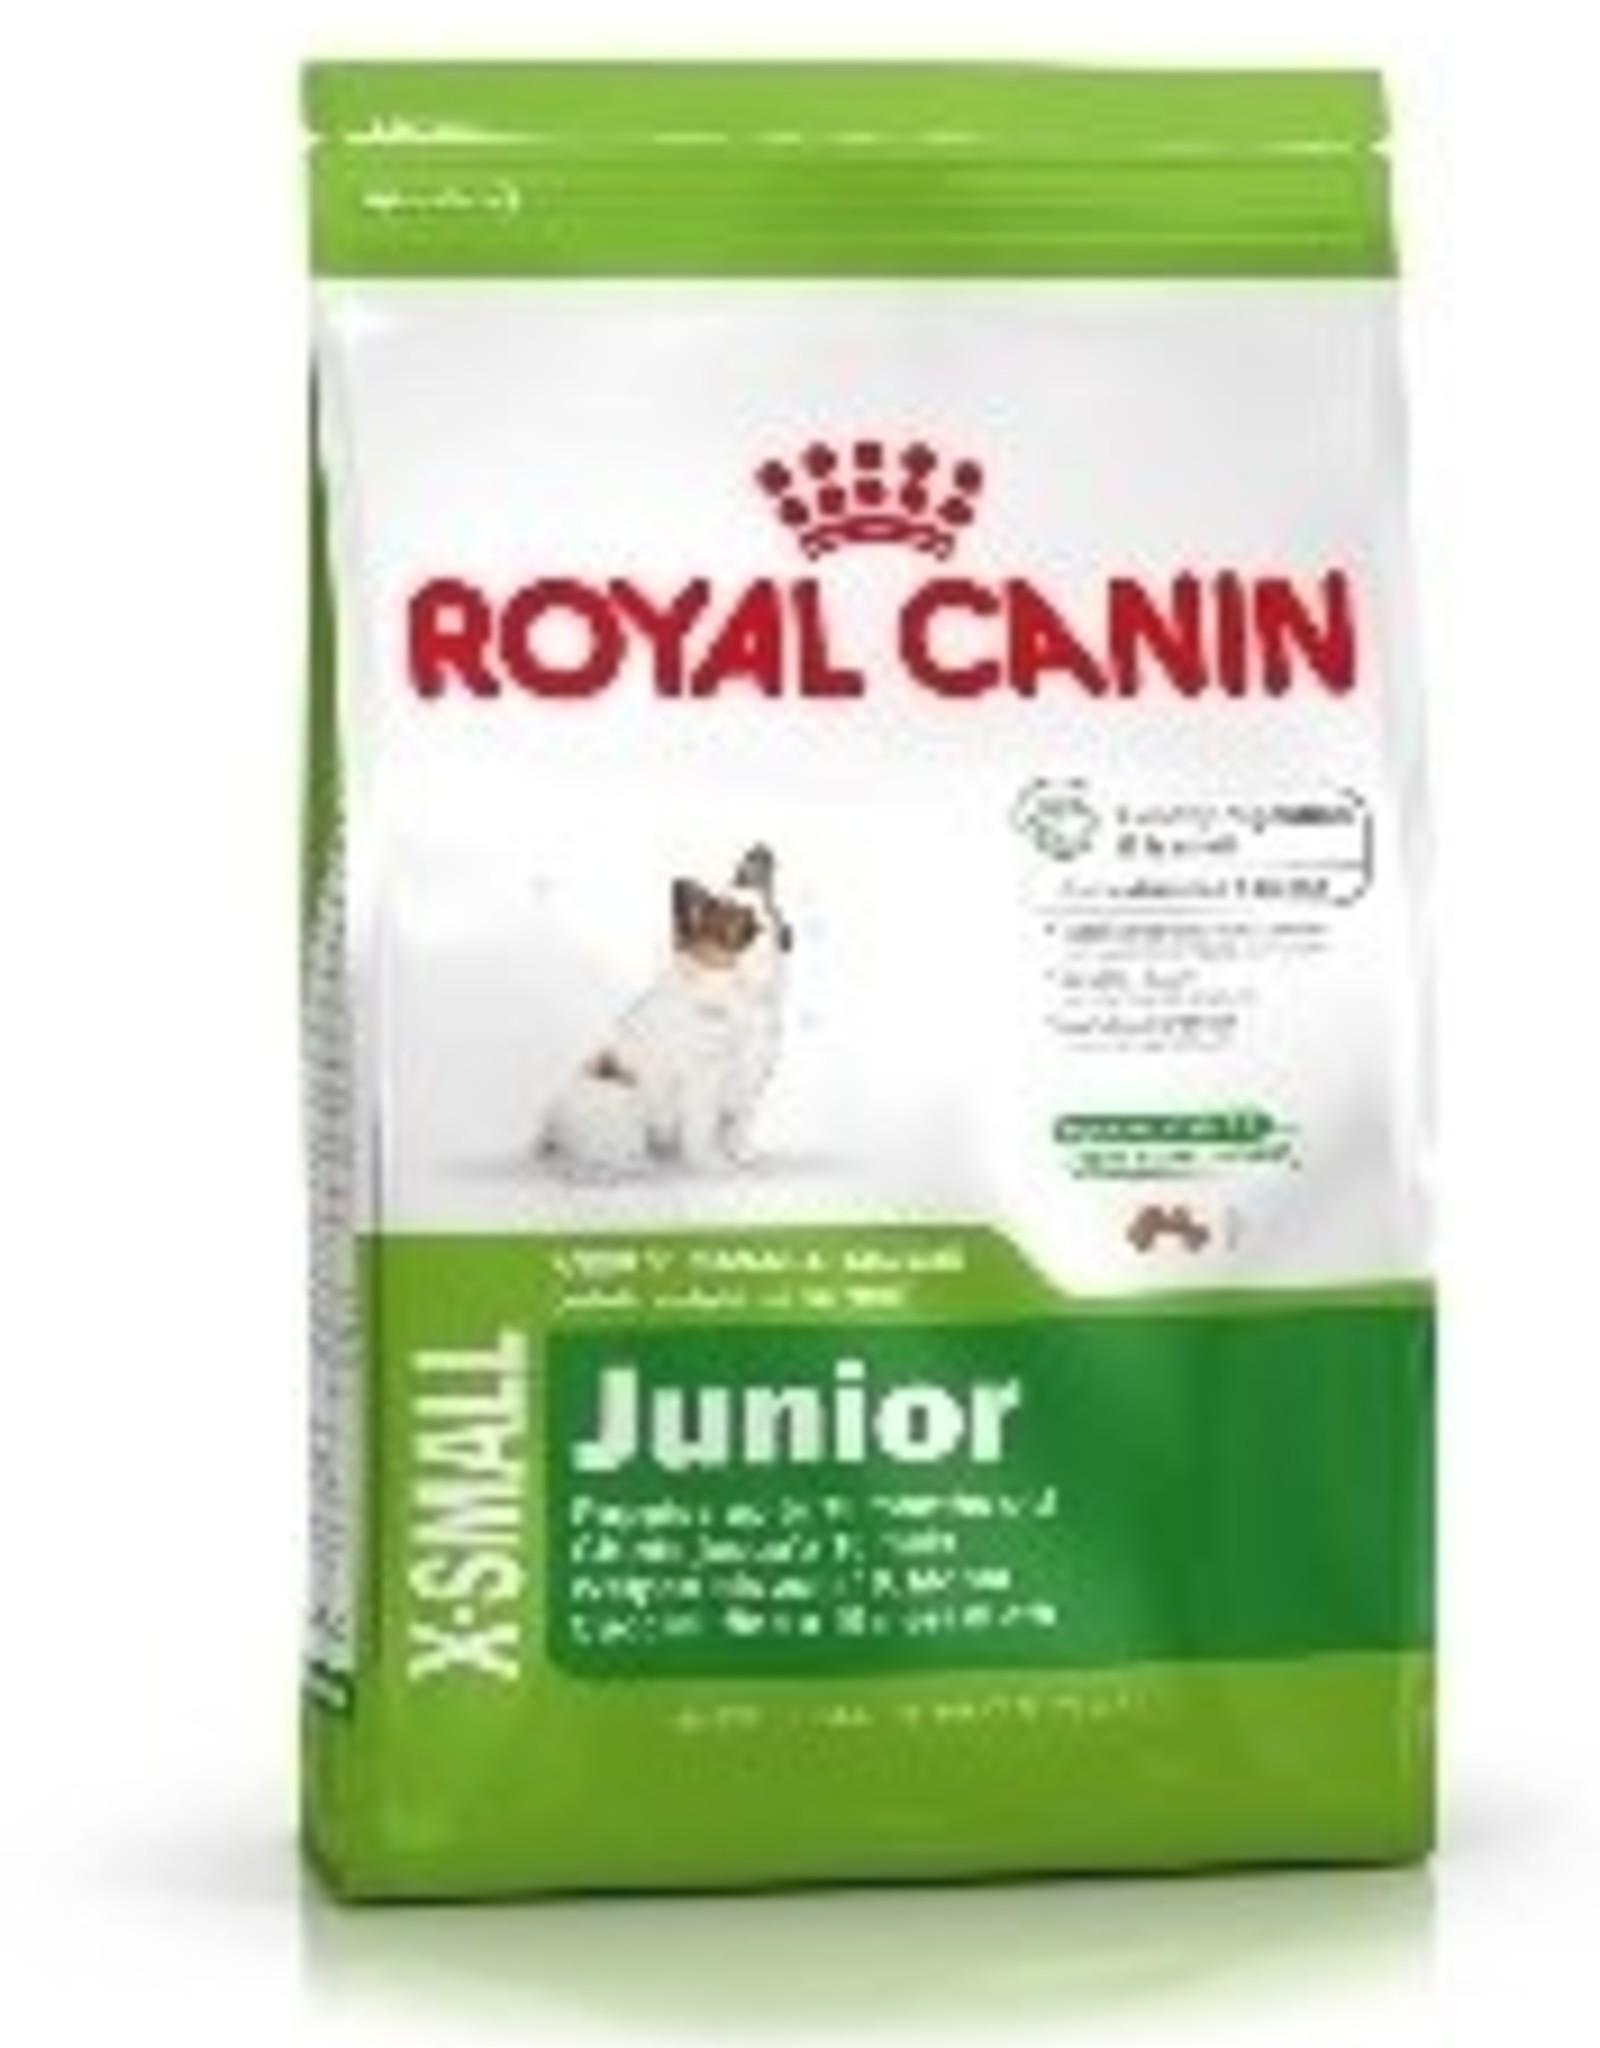 Royal Canin Royal Canin Shn X Small Junior Canine 1,5kg